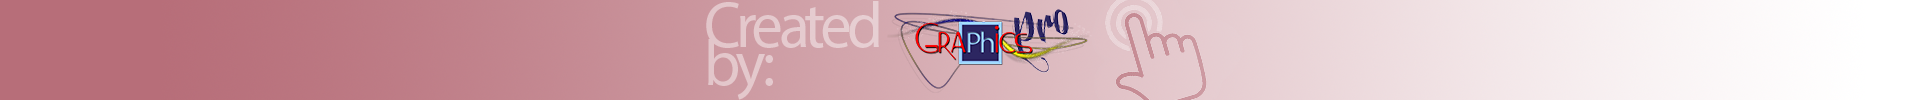 GraphicsPro